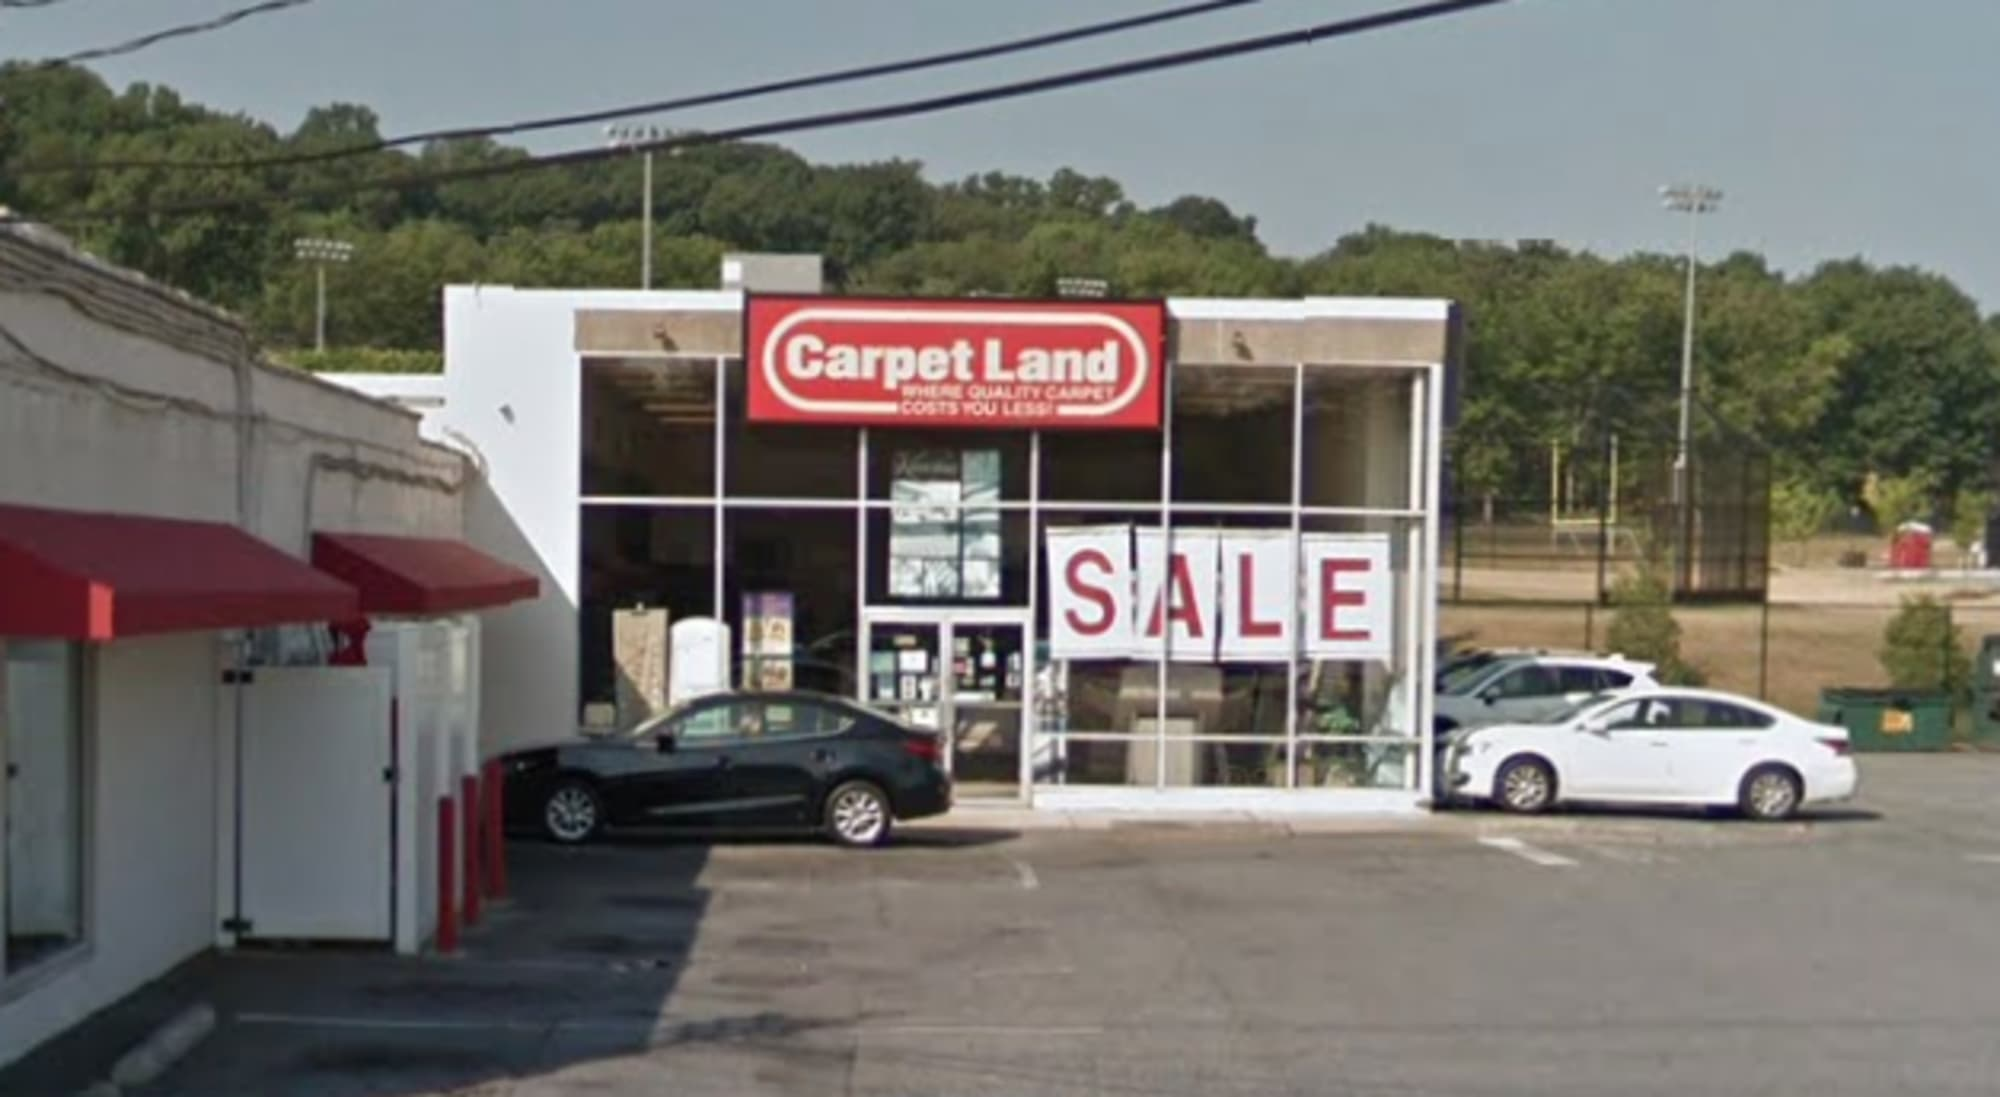 Carpet Land Inc. - 936 York Rd Towson, MD 21204